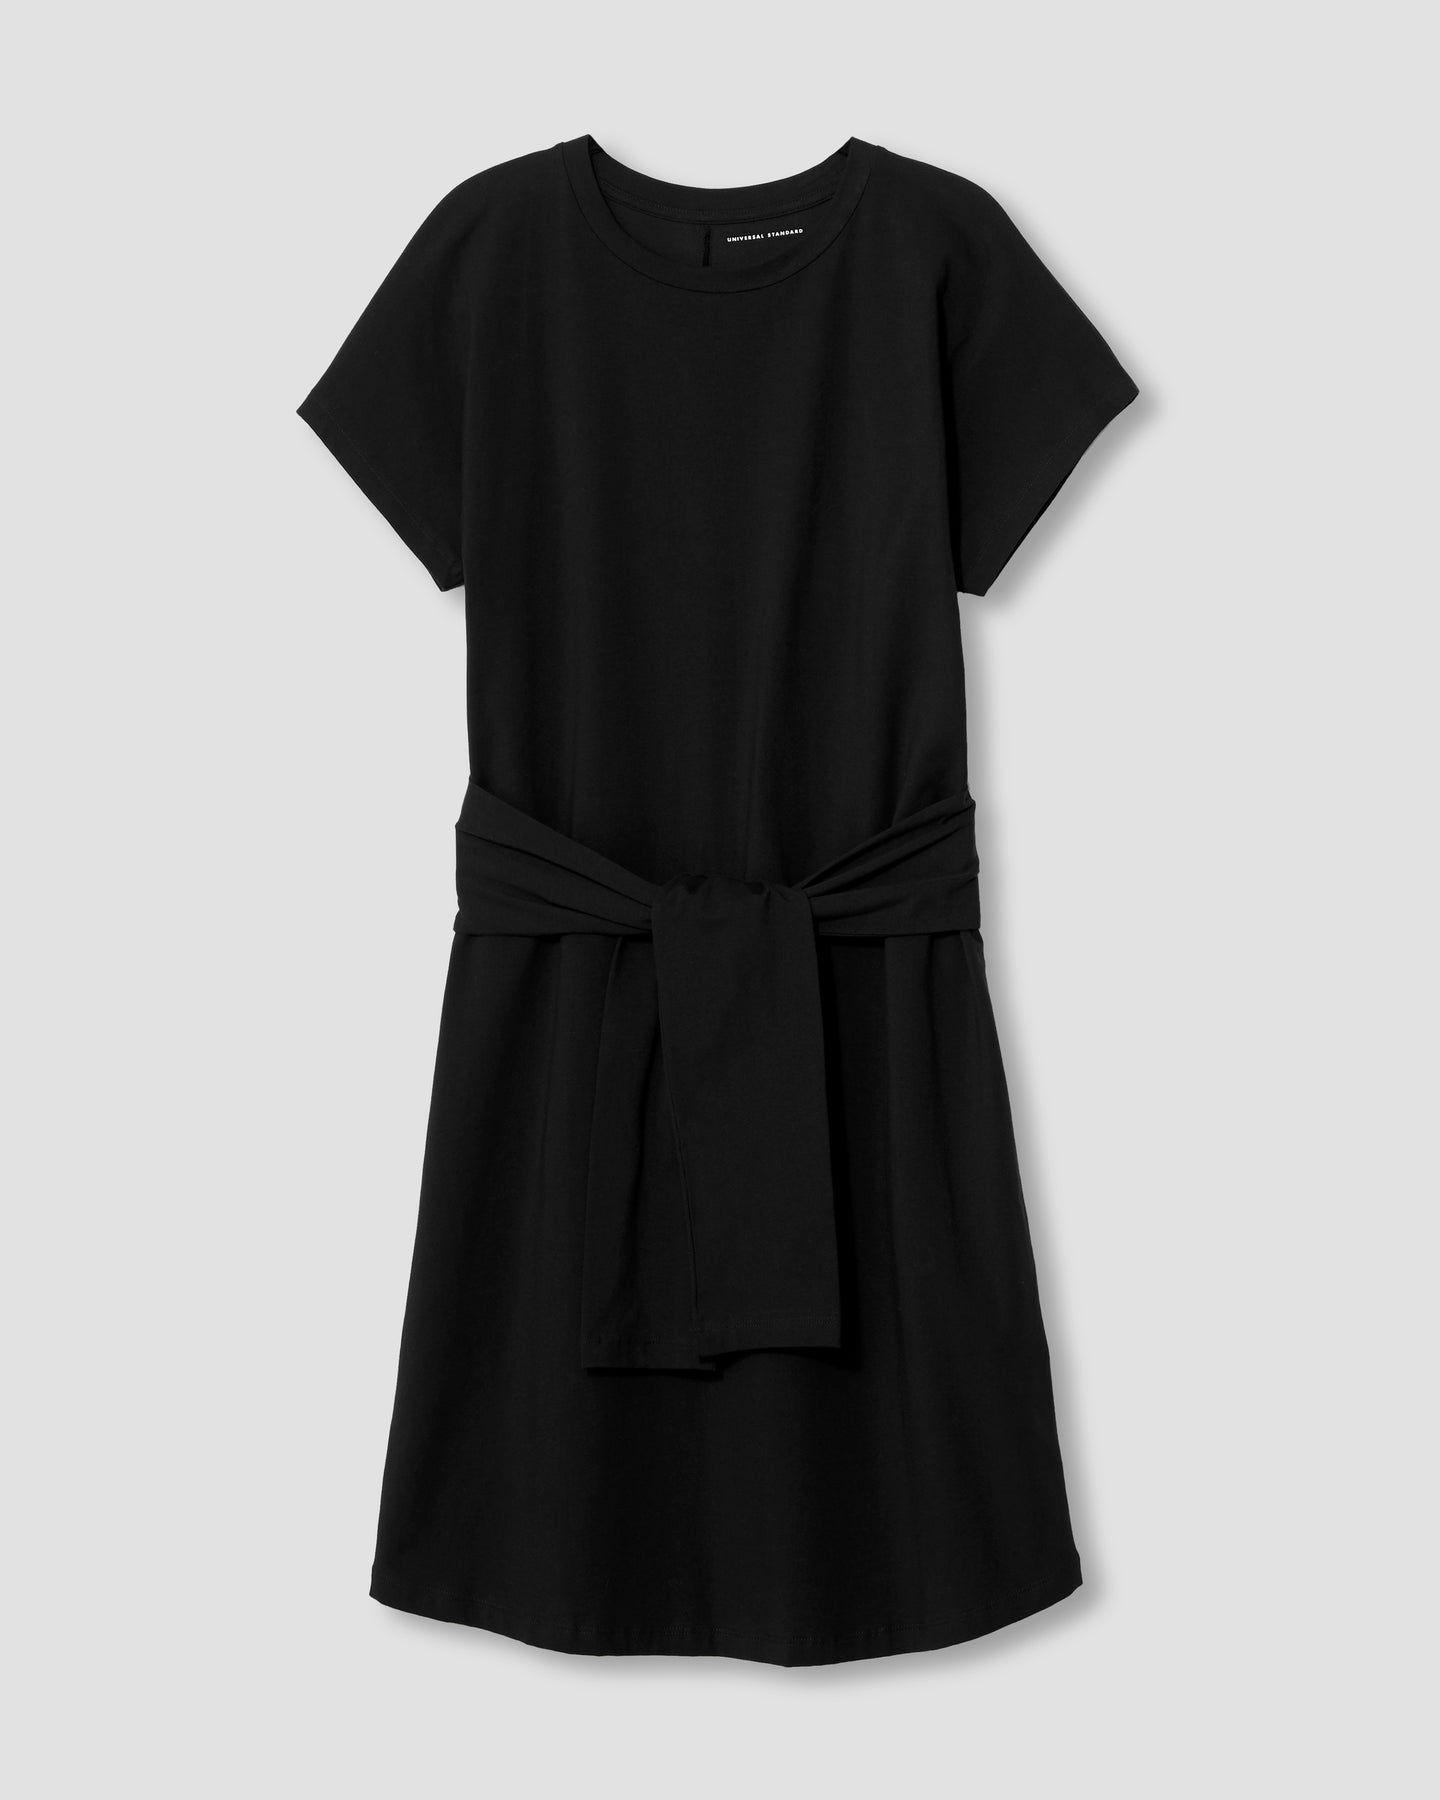 Misa Jersey Dress - Black - image 1